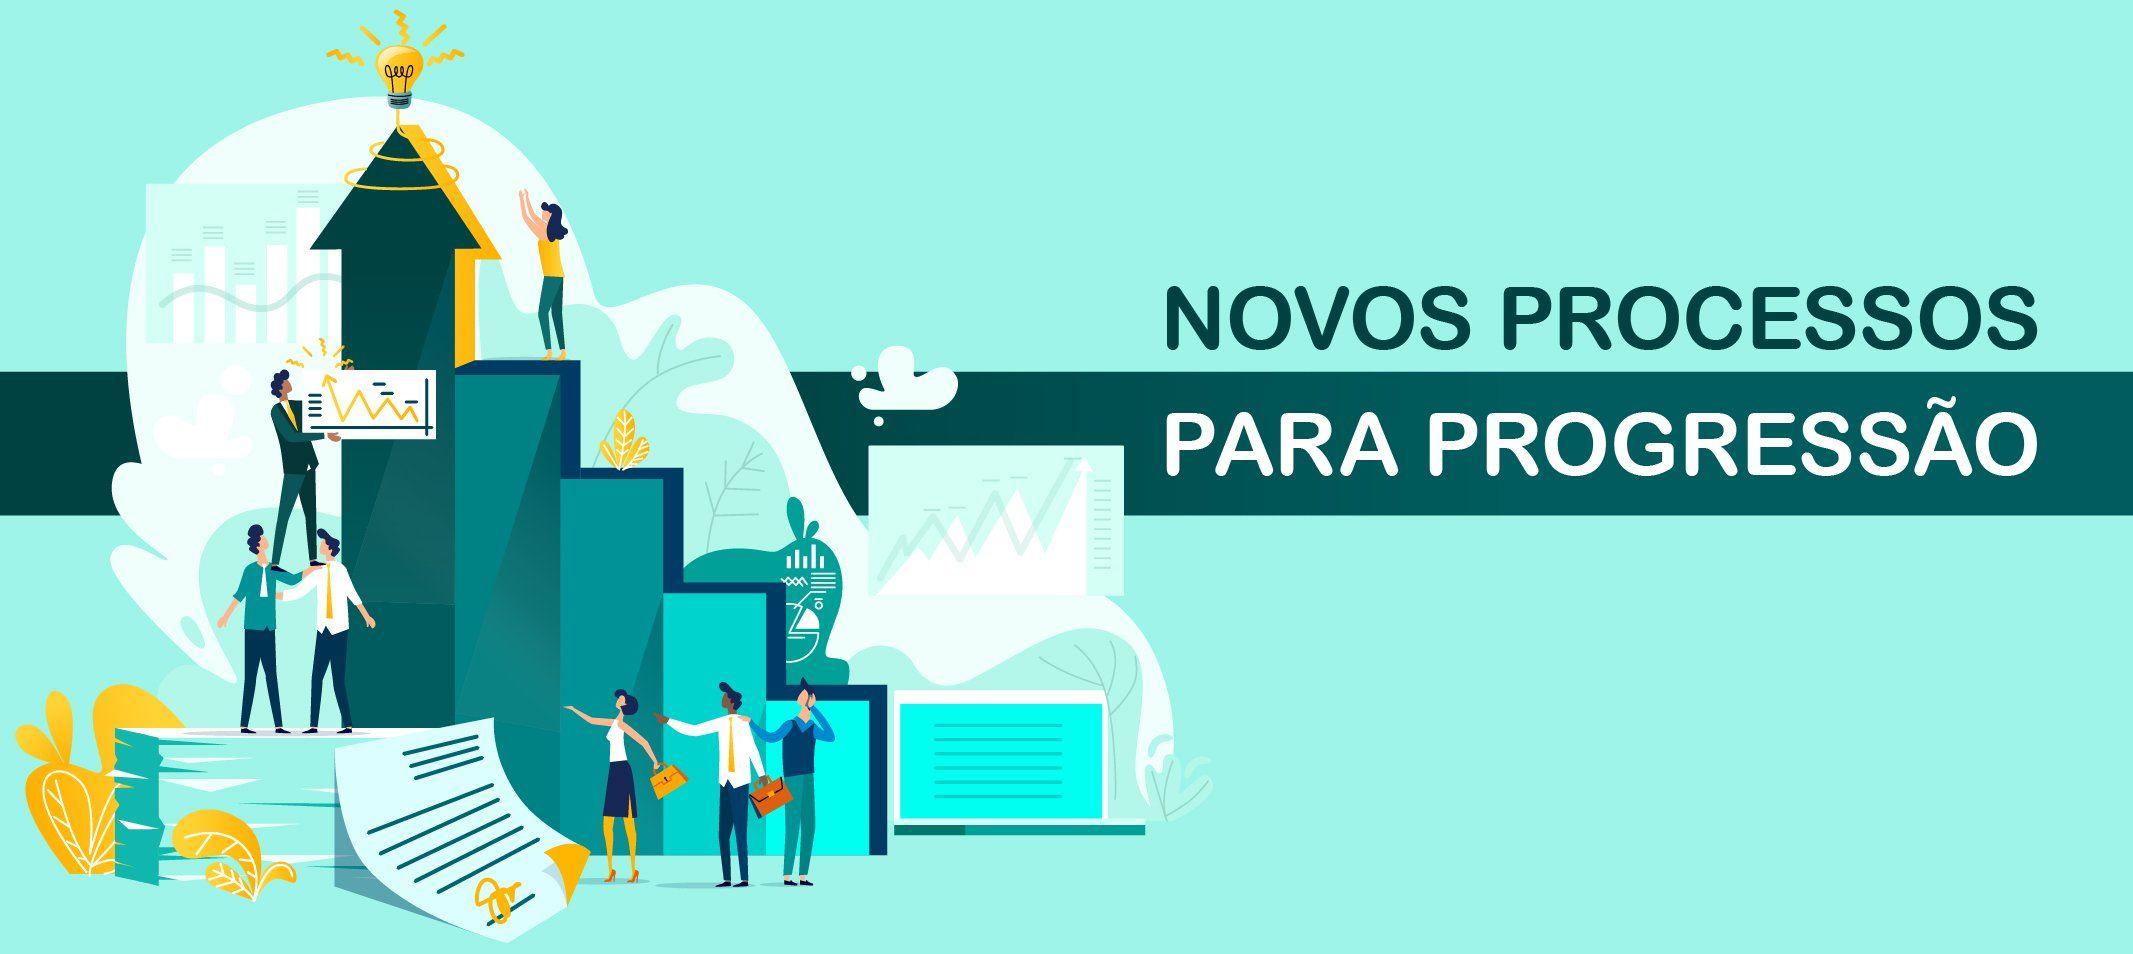 Progesp divulga novos procedimentos para servidor solicitar incentivos